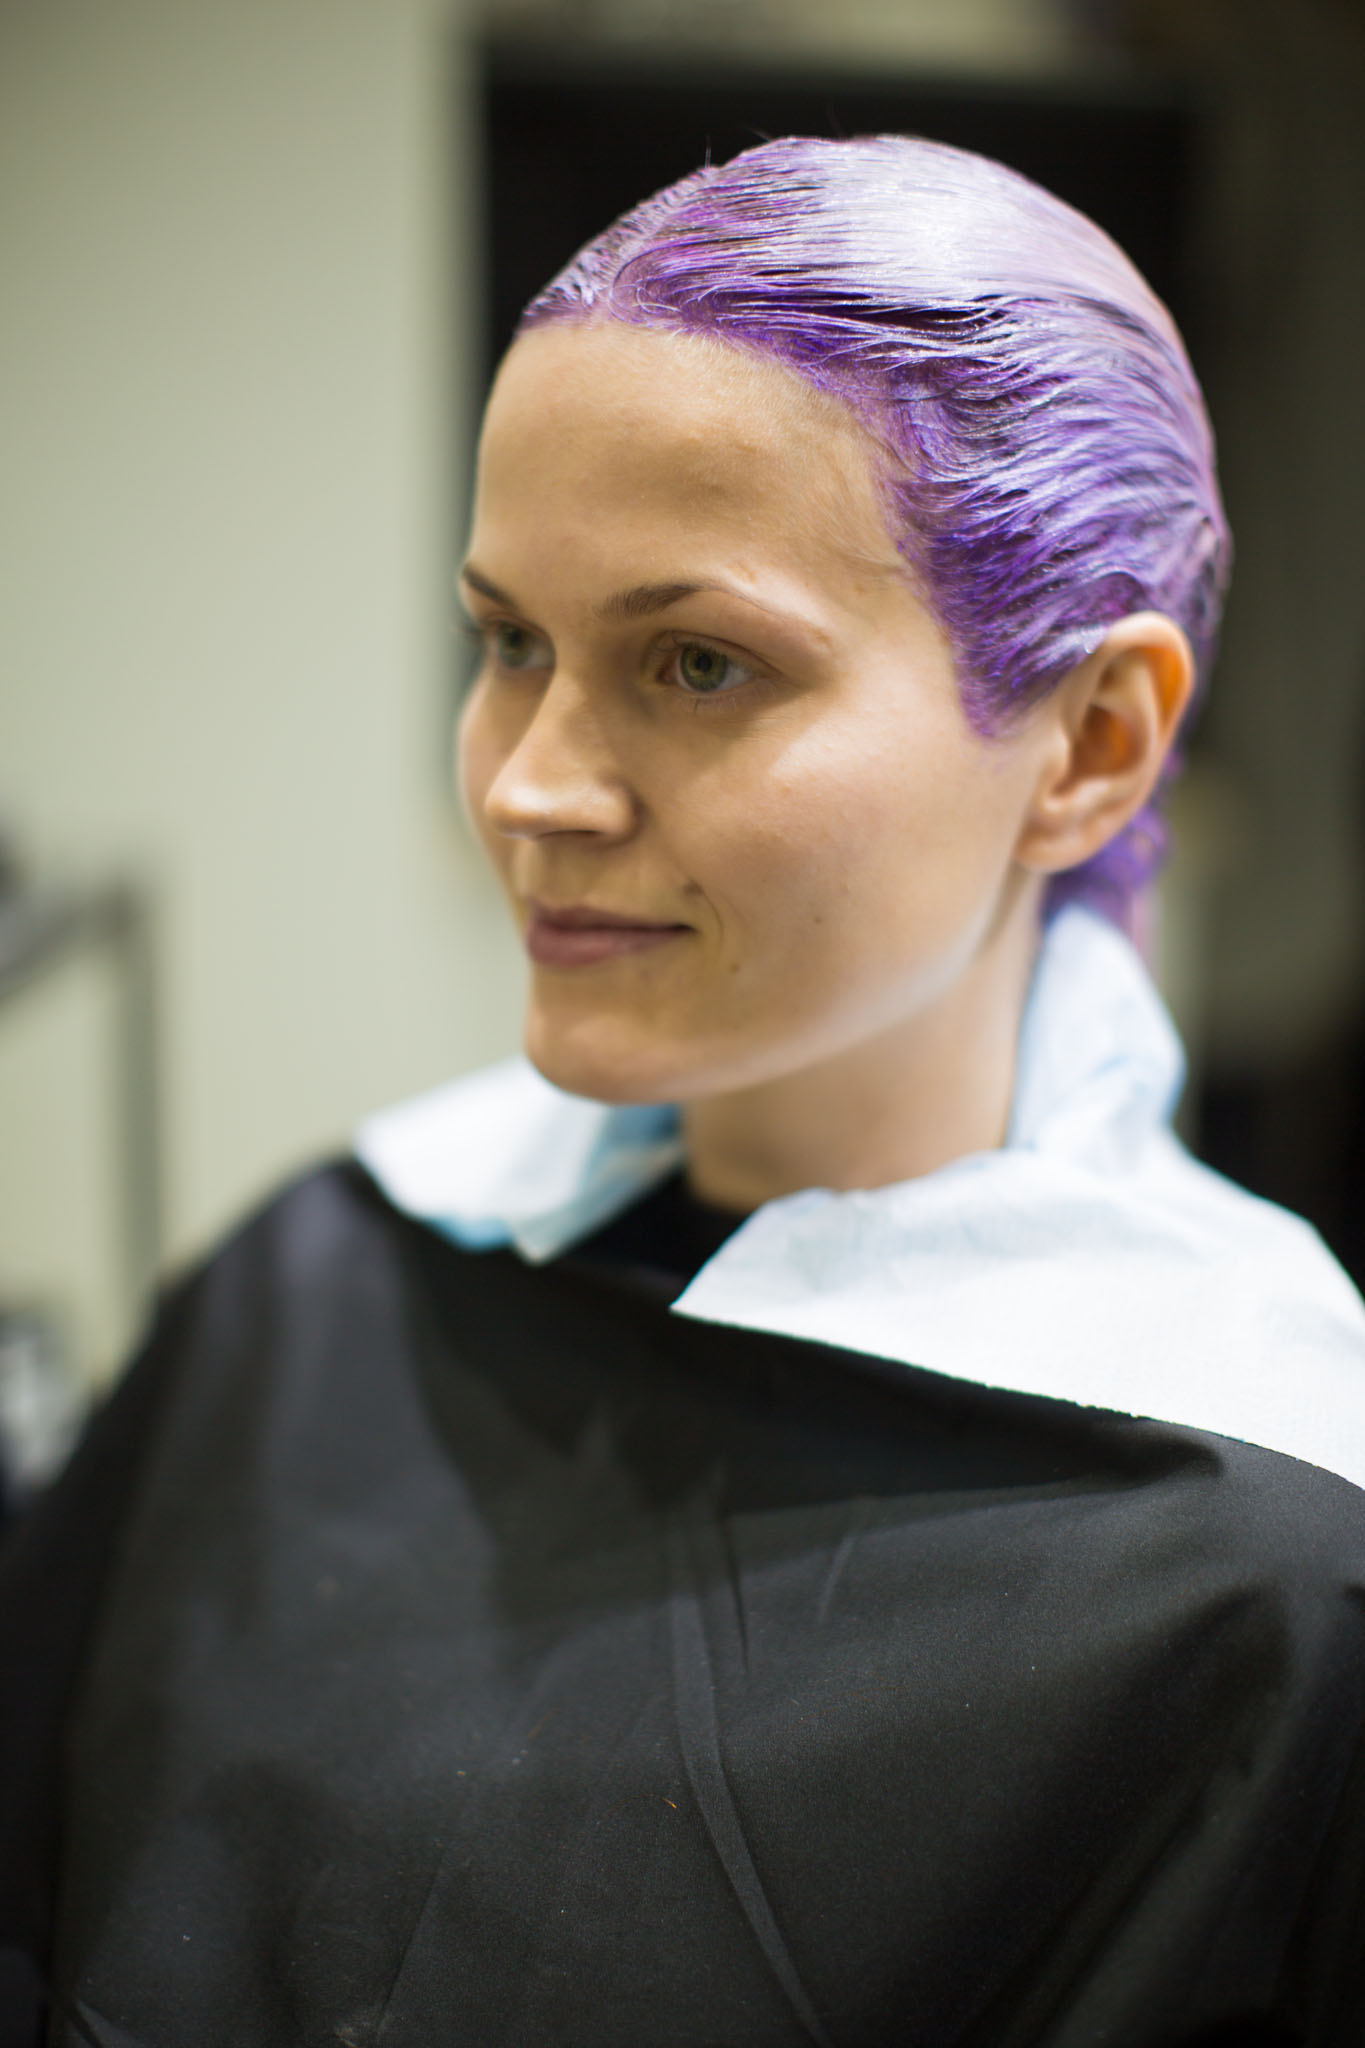 väripäässä violetti